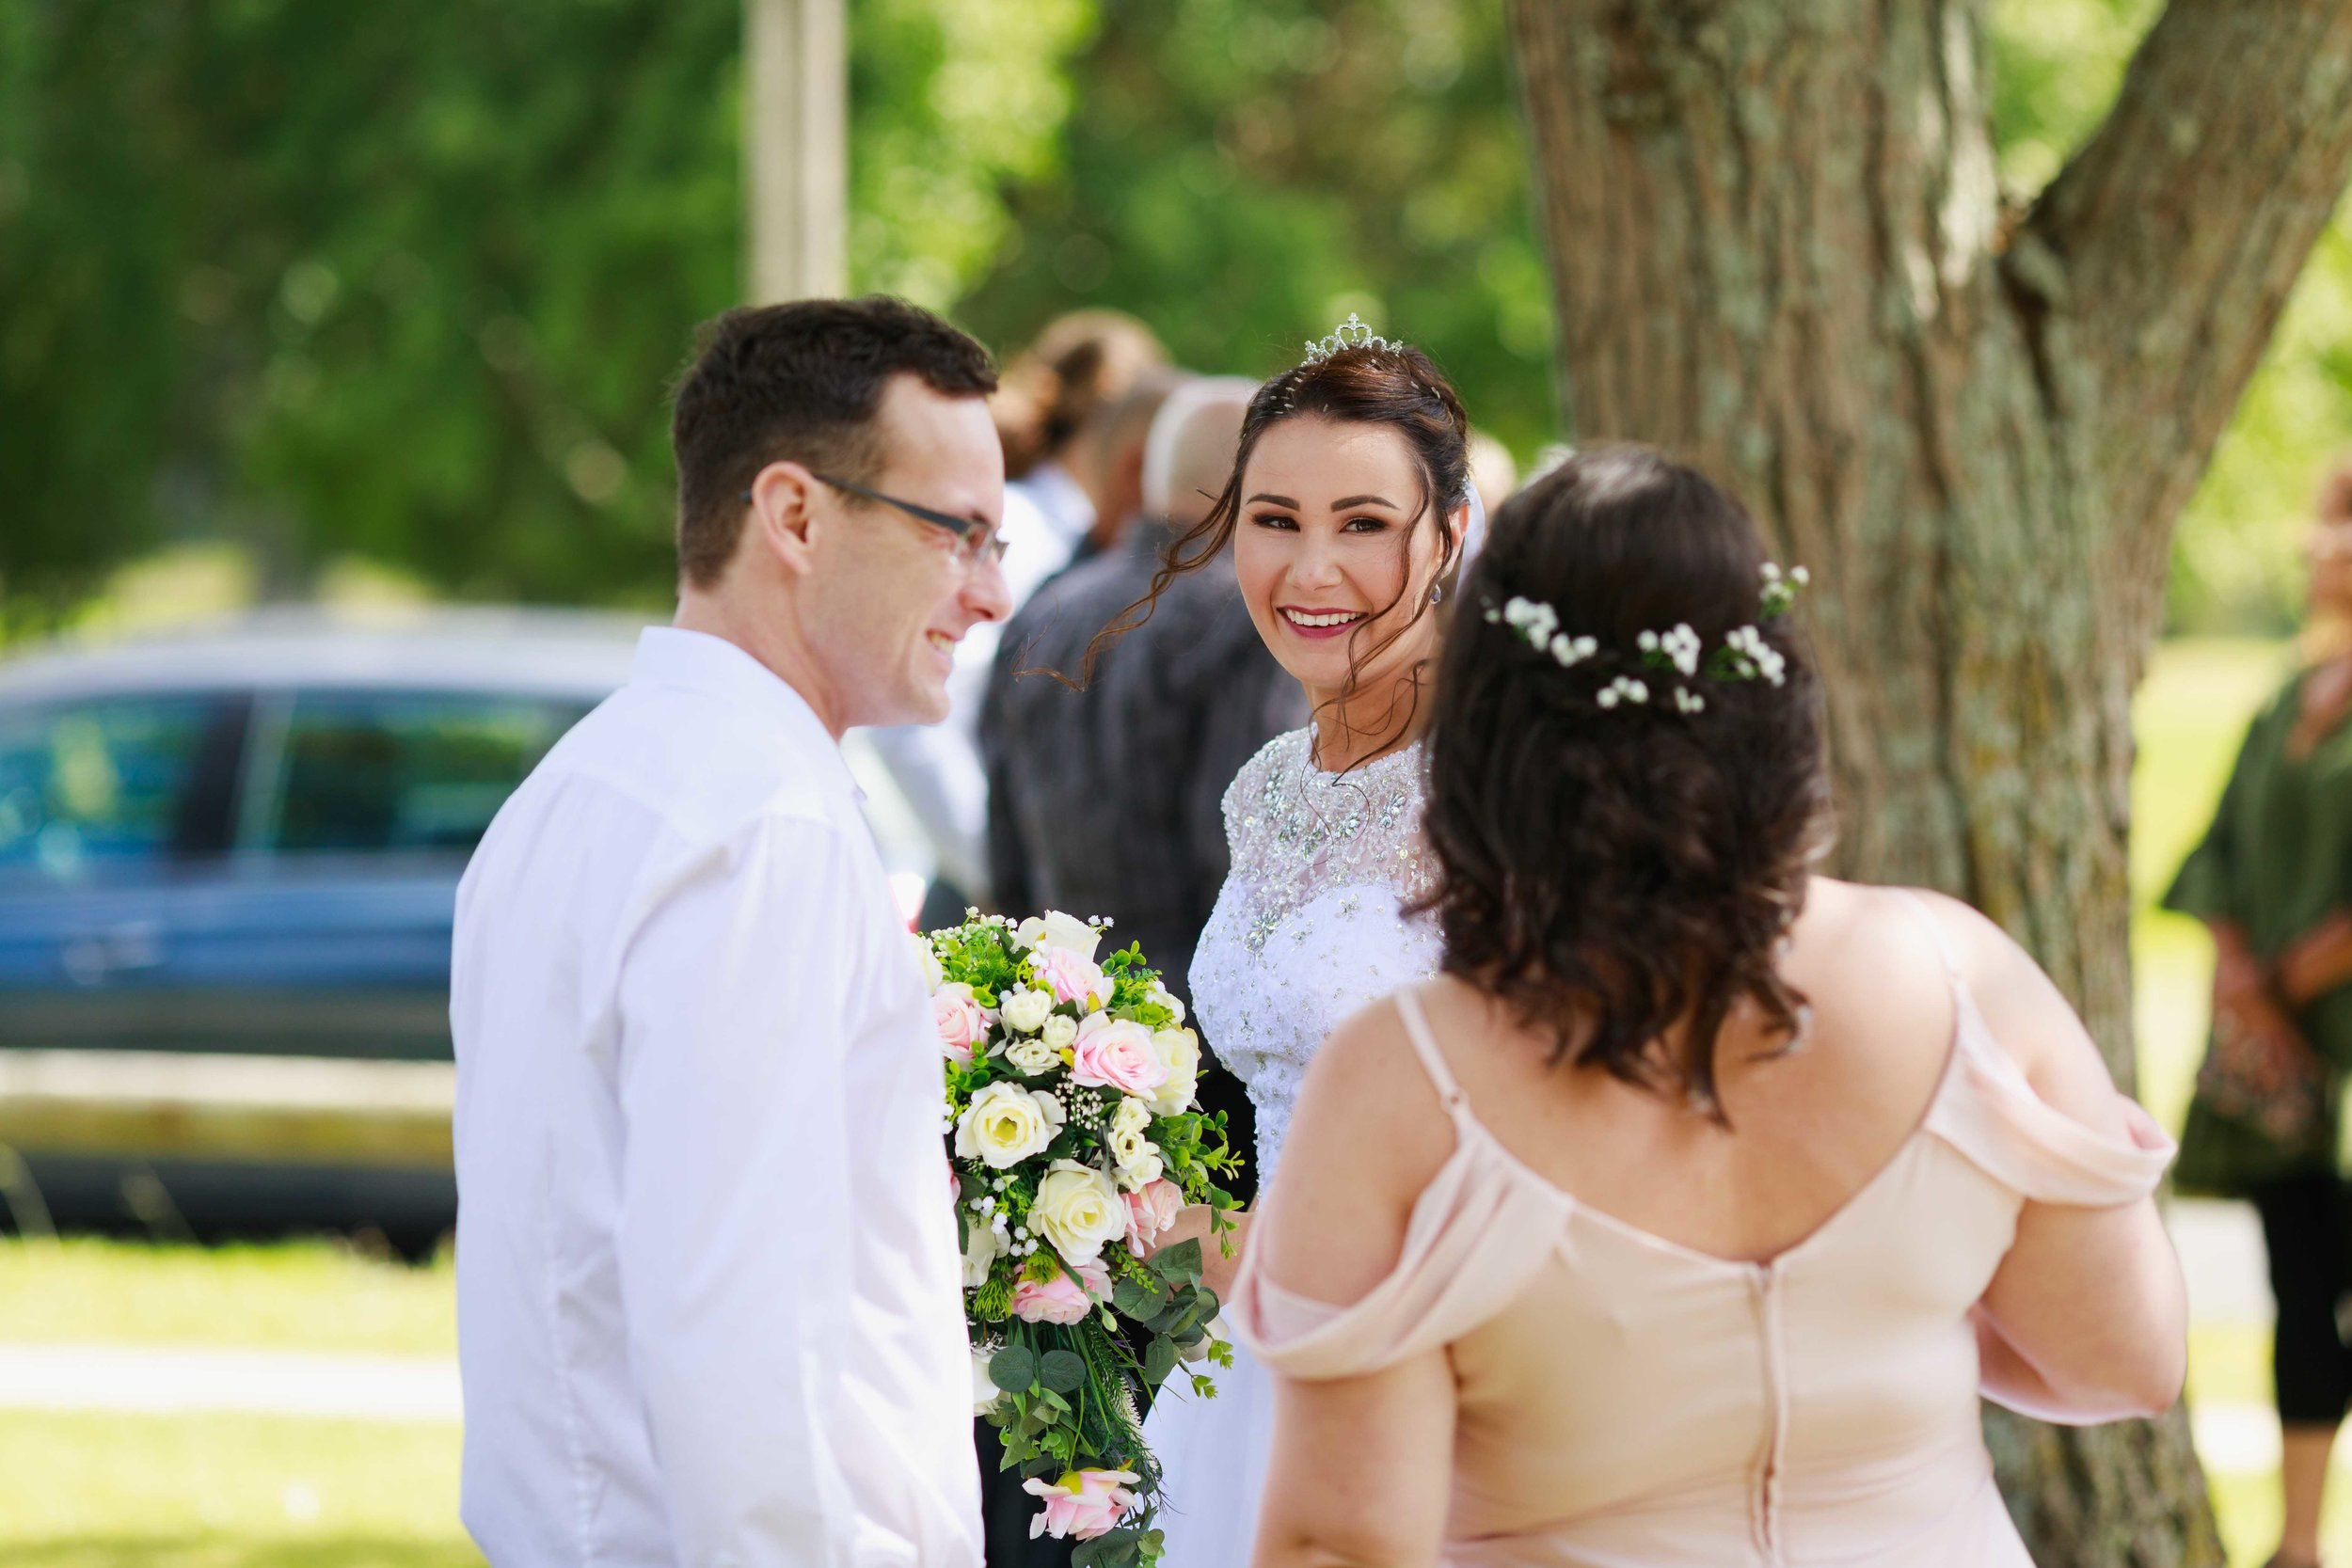 the-chalet-highlight-wedding-photography-palmerston-north-95.jpg